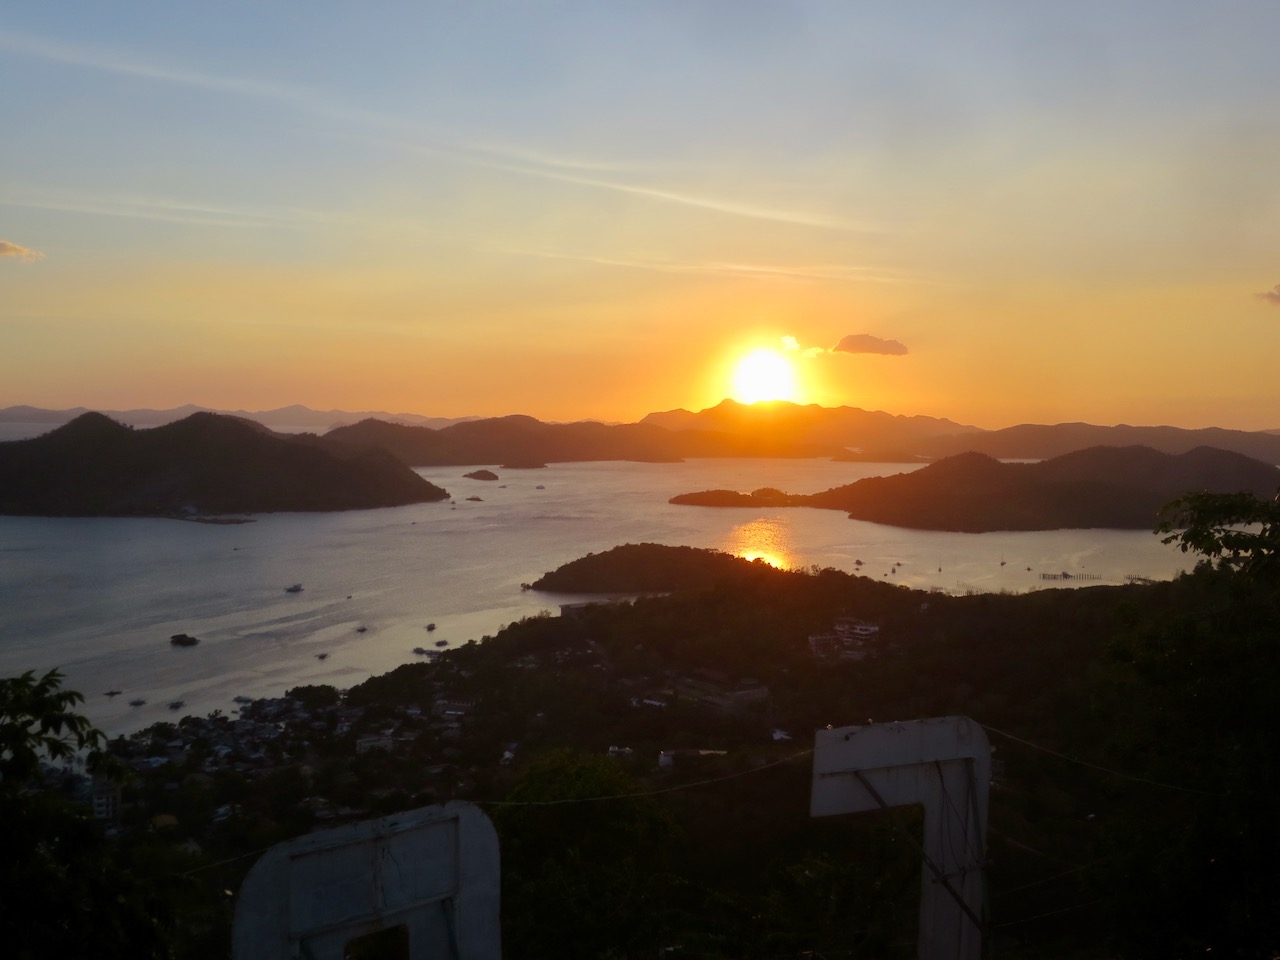 Pôr do sol em Coron